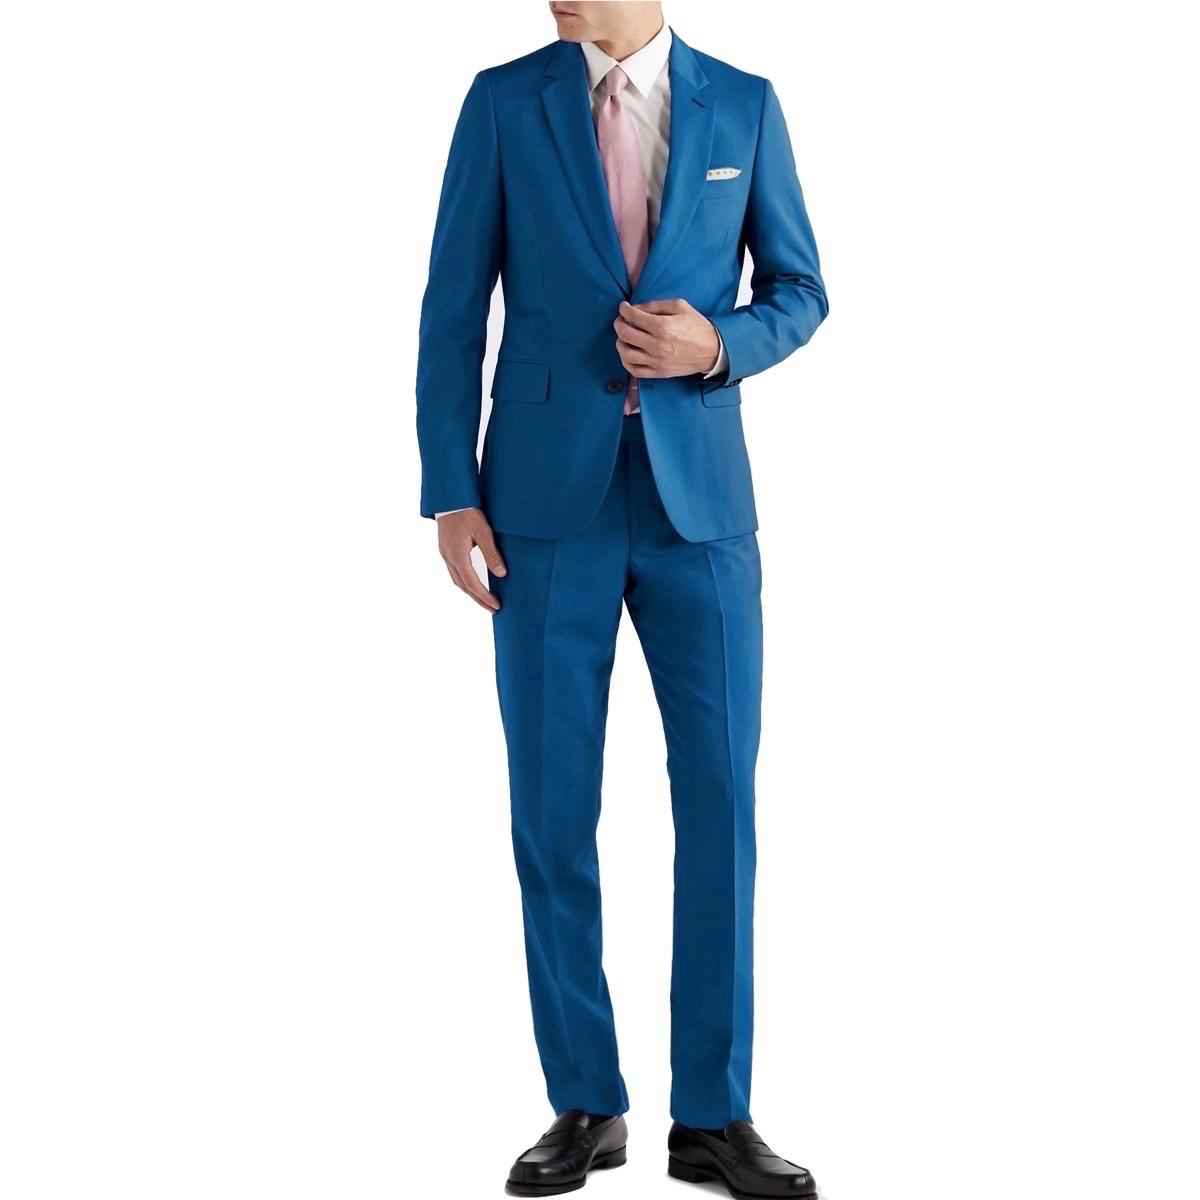 Paul Smith Byard Suit Blue.jpg